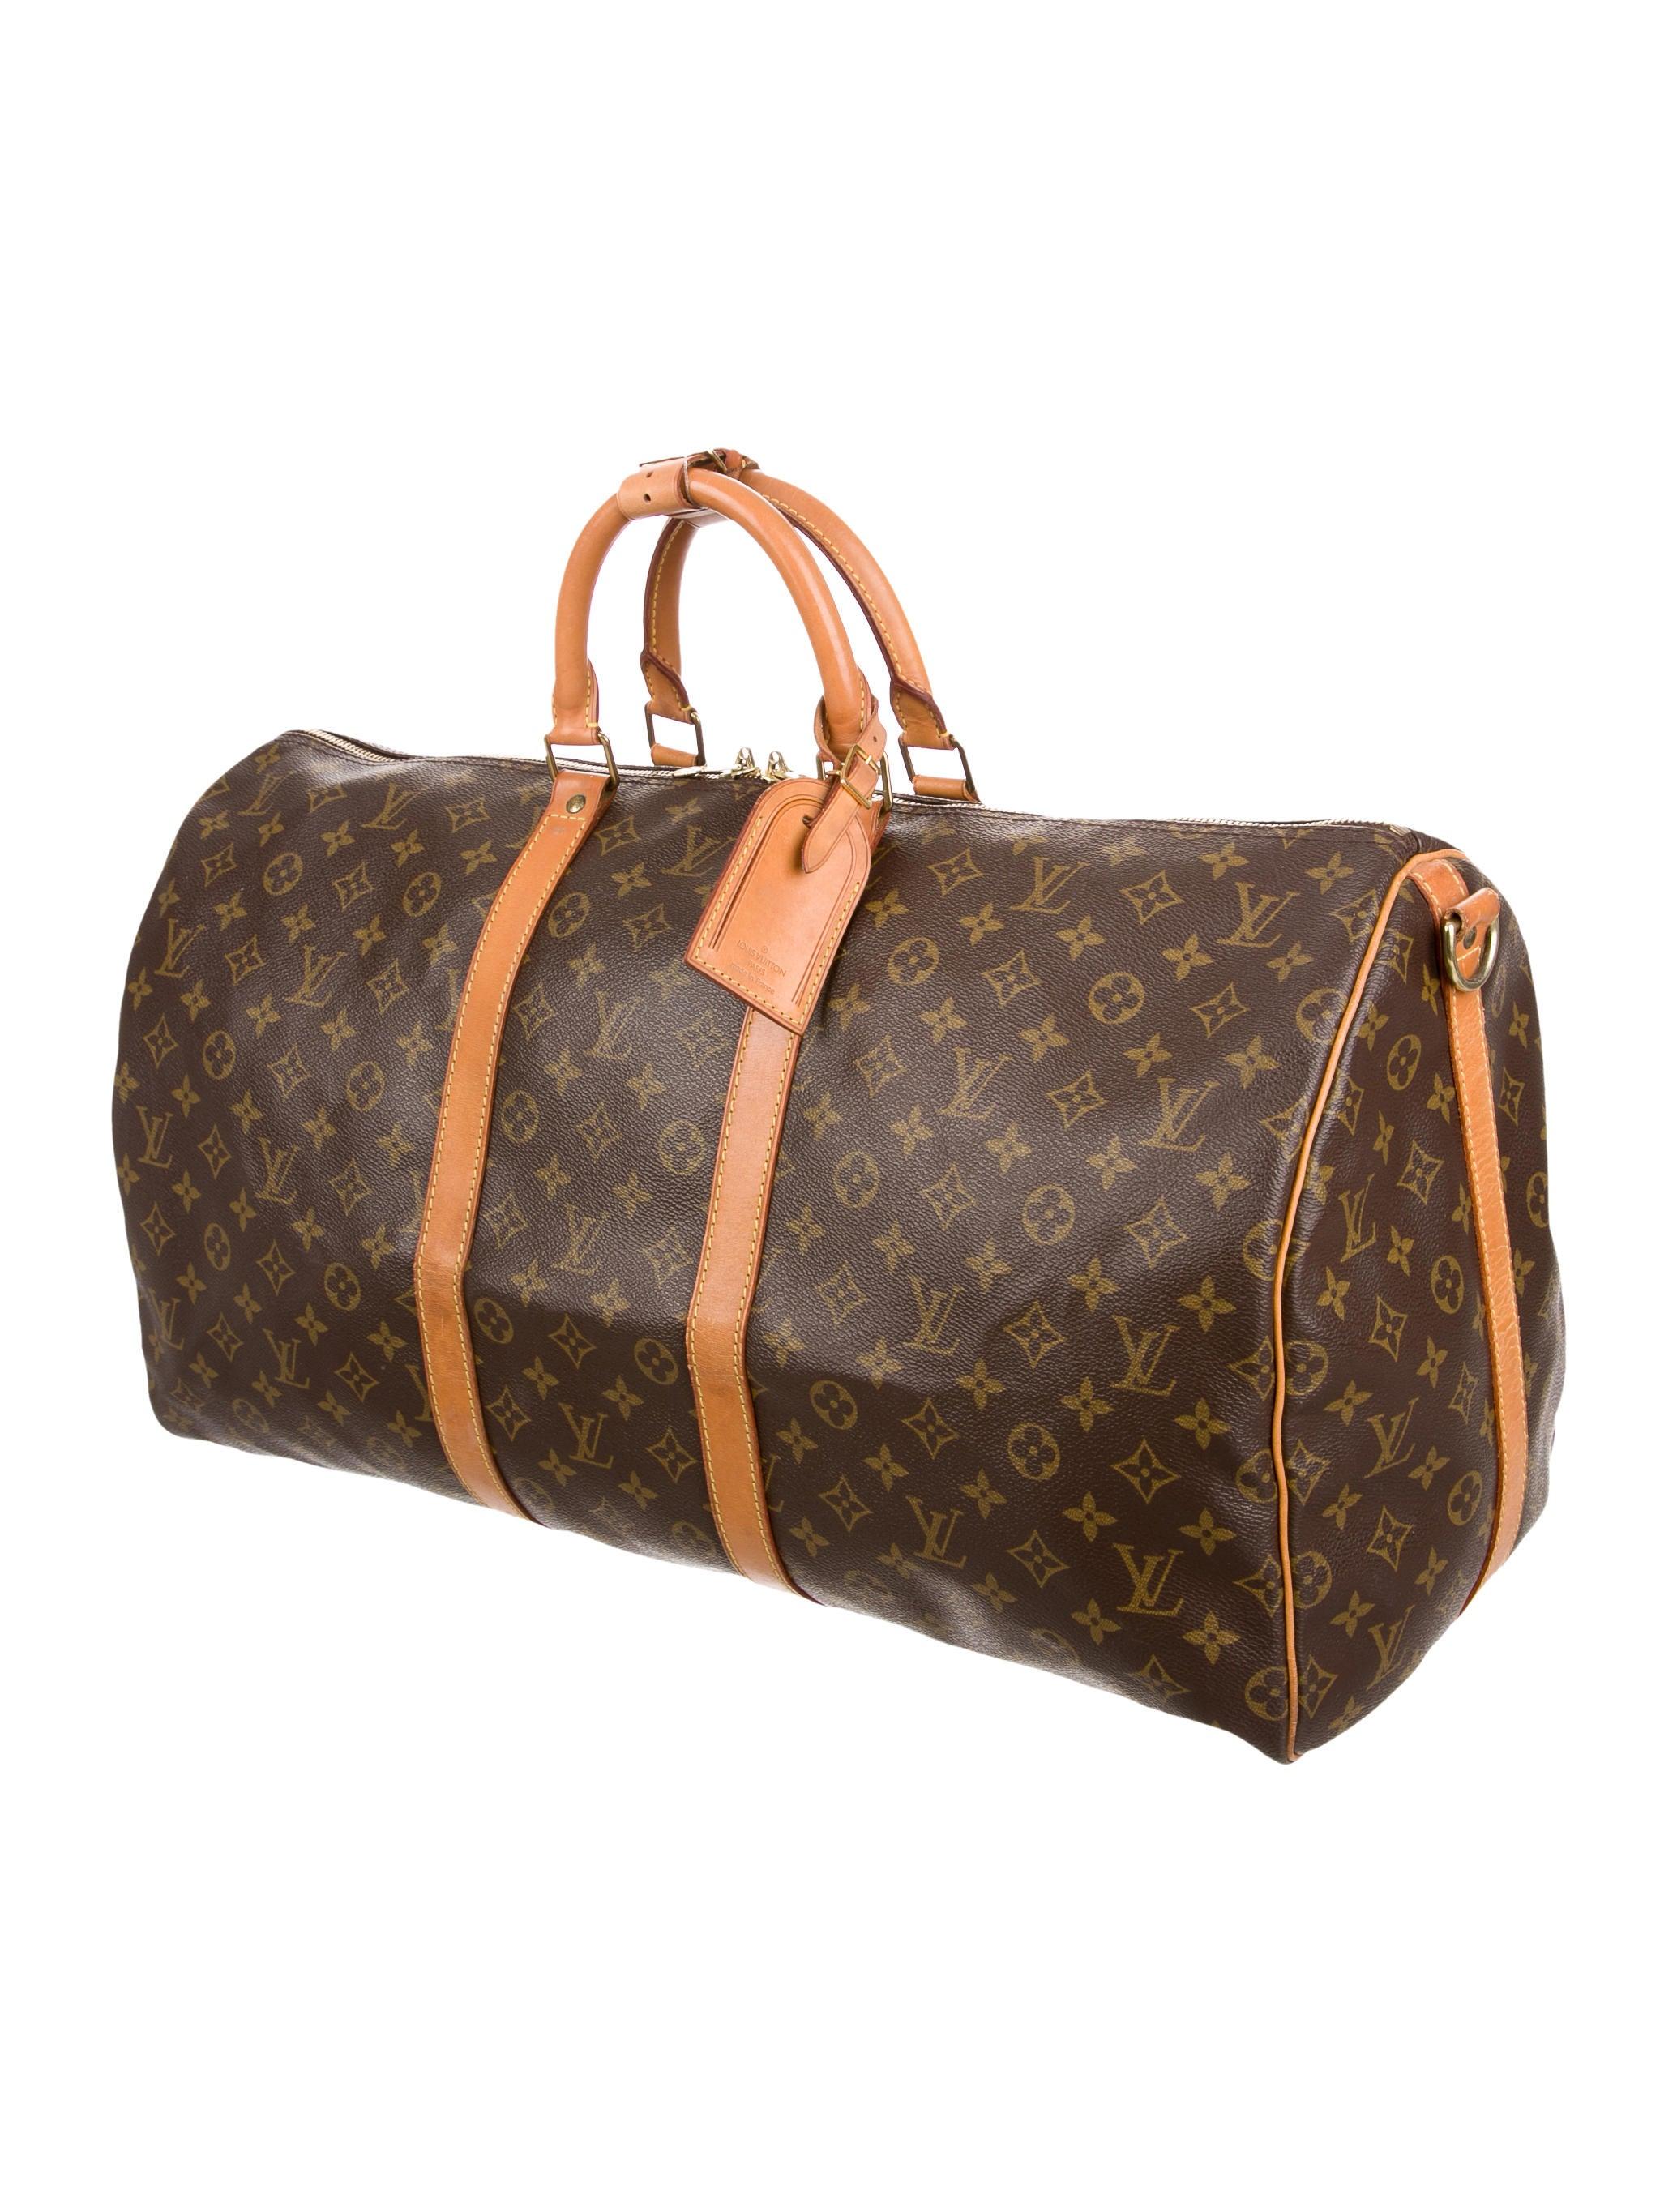 louis vuitton monogram keepall bandouli re 55 bags lou110655 the realreal. Black Bedroom Furniture Sets. Home Design Ideas